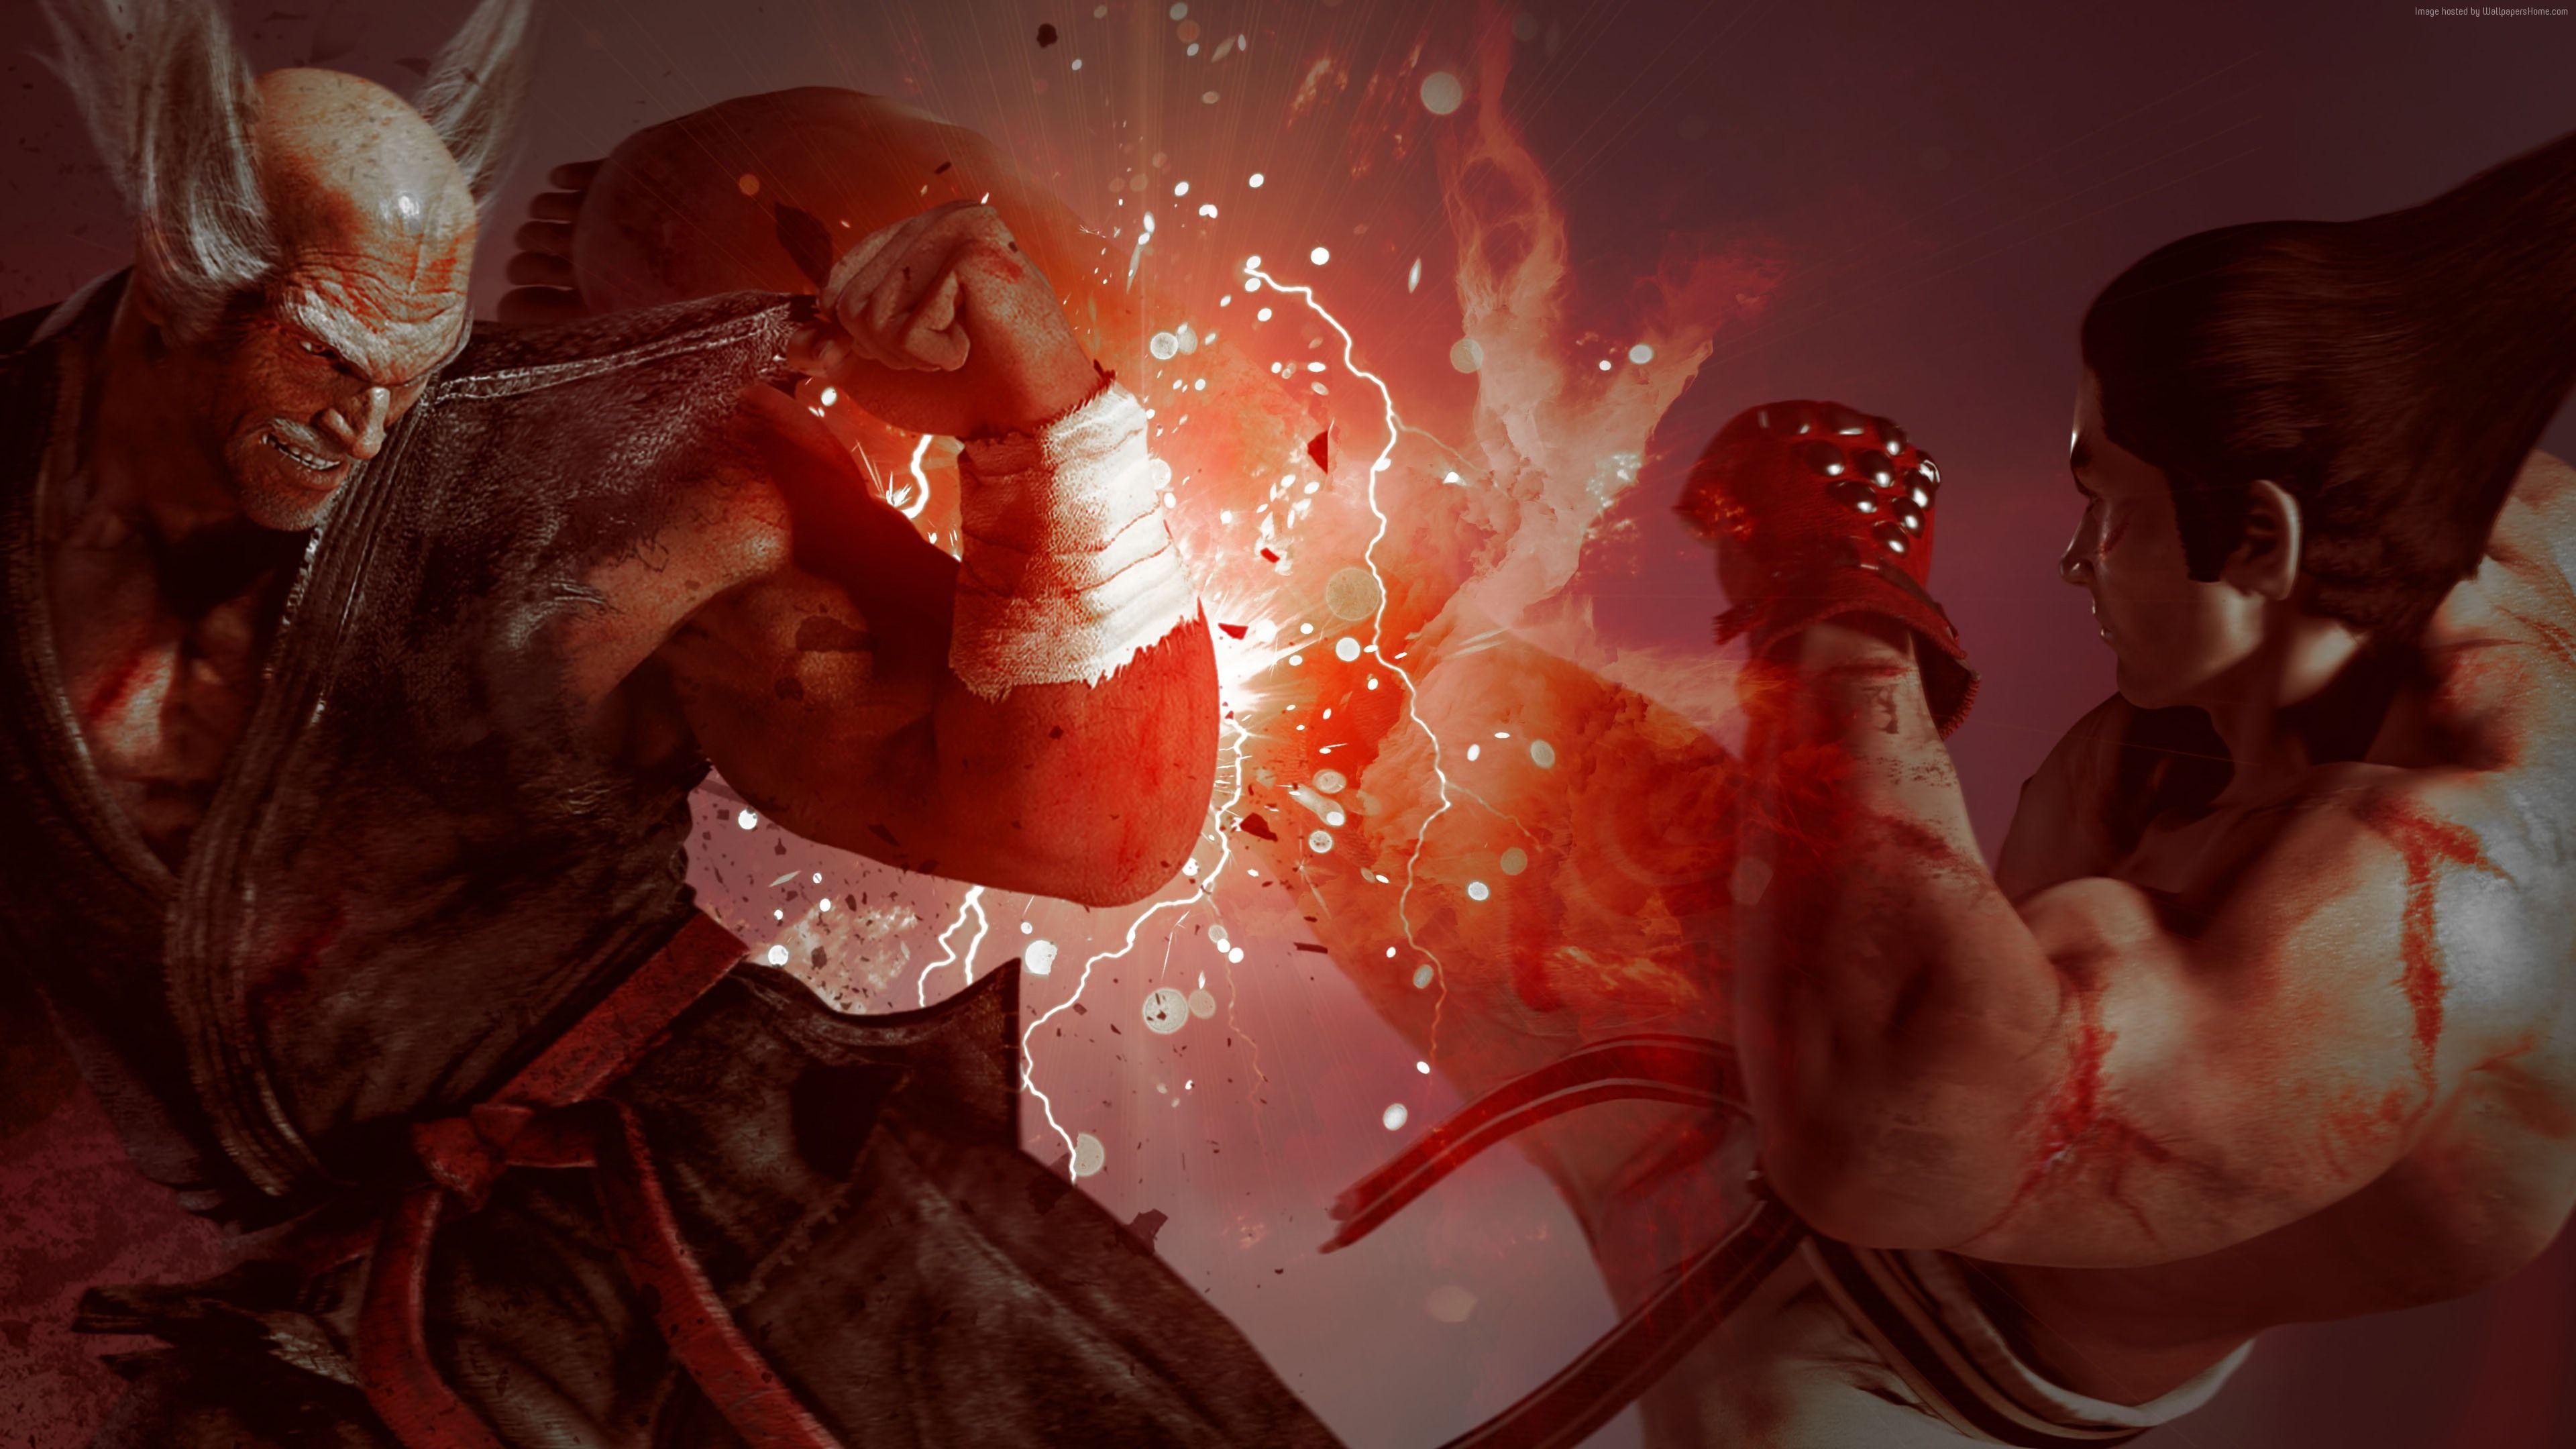 Heihachi Vs Kazuya Tekken 7 4k Wallpaper 3840x2160 Samsung